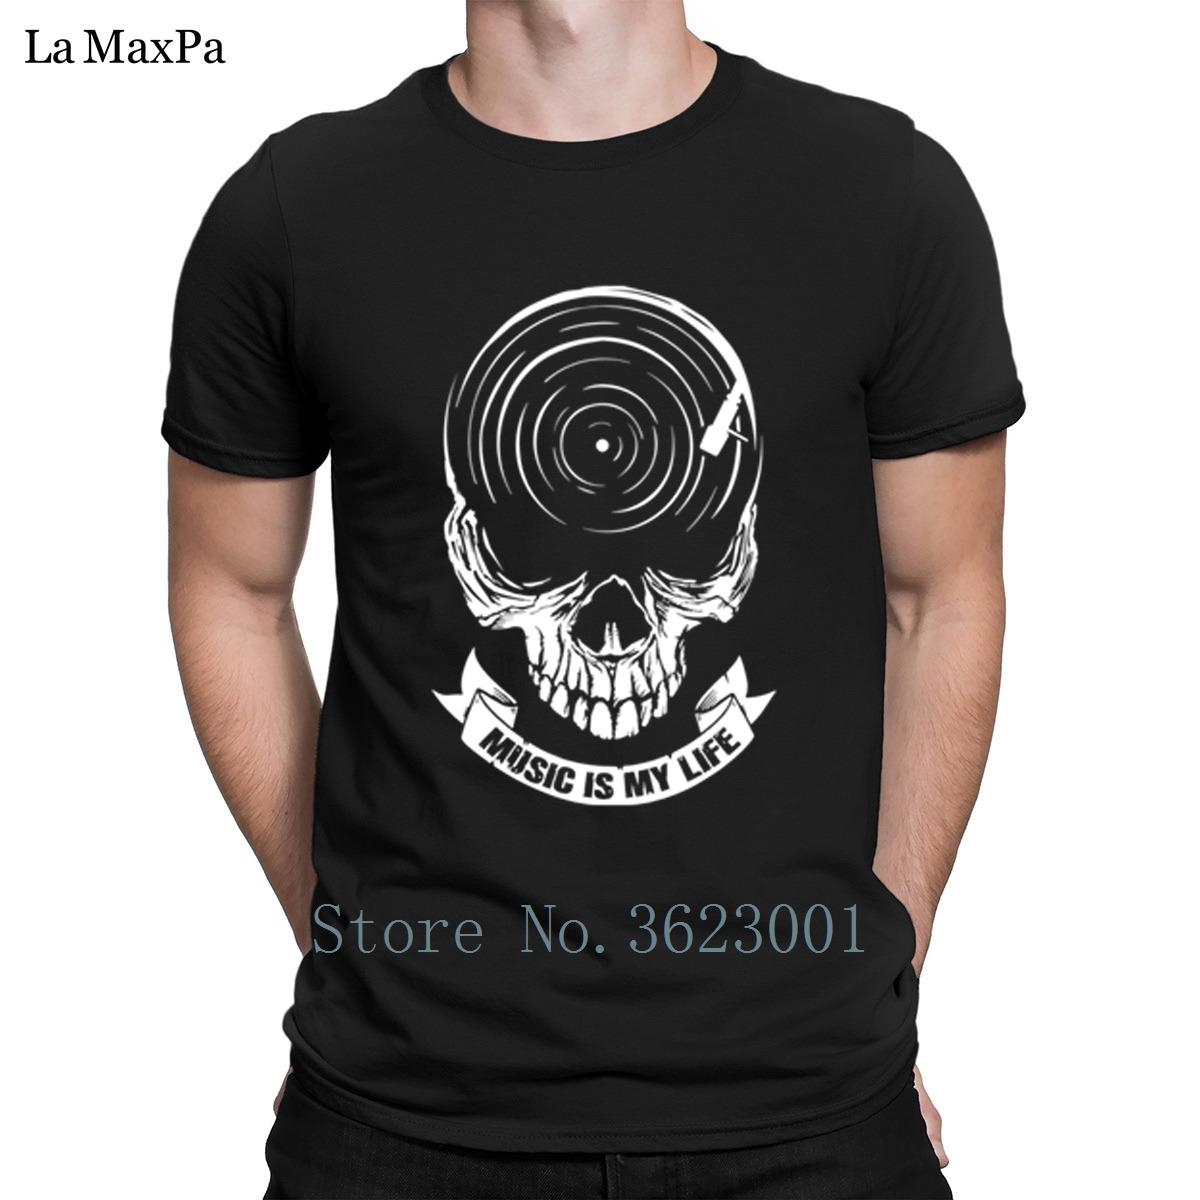 250b446a Knitted Slim T Shirt Clothing Music Is My Life T-Shirt Classical Funky  Tshirt Man S-3xl Men's T Shirt Hiphop Top